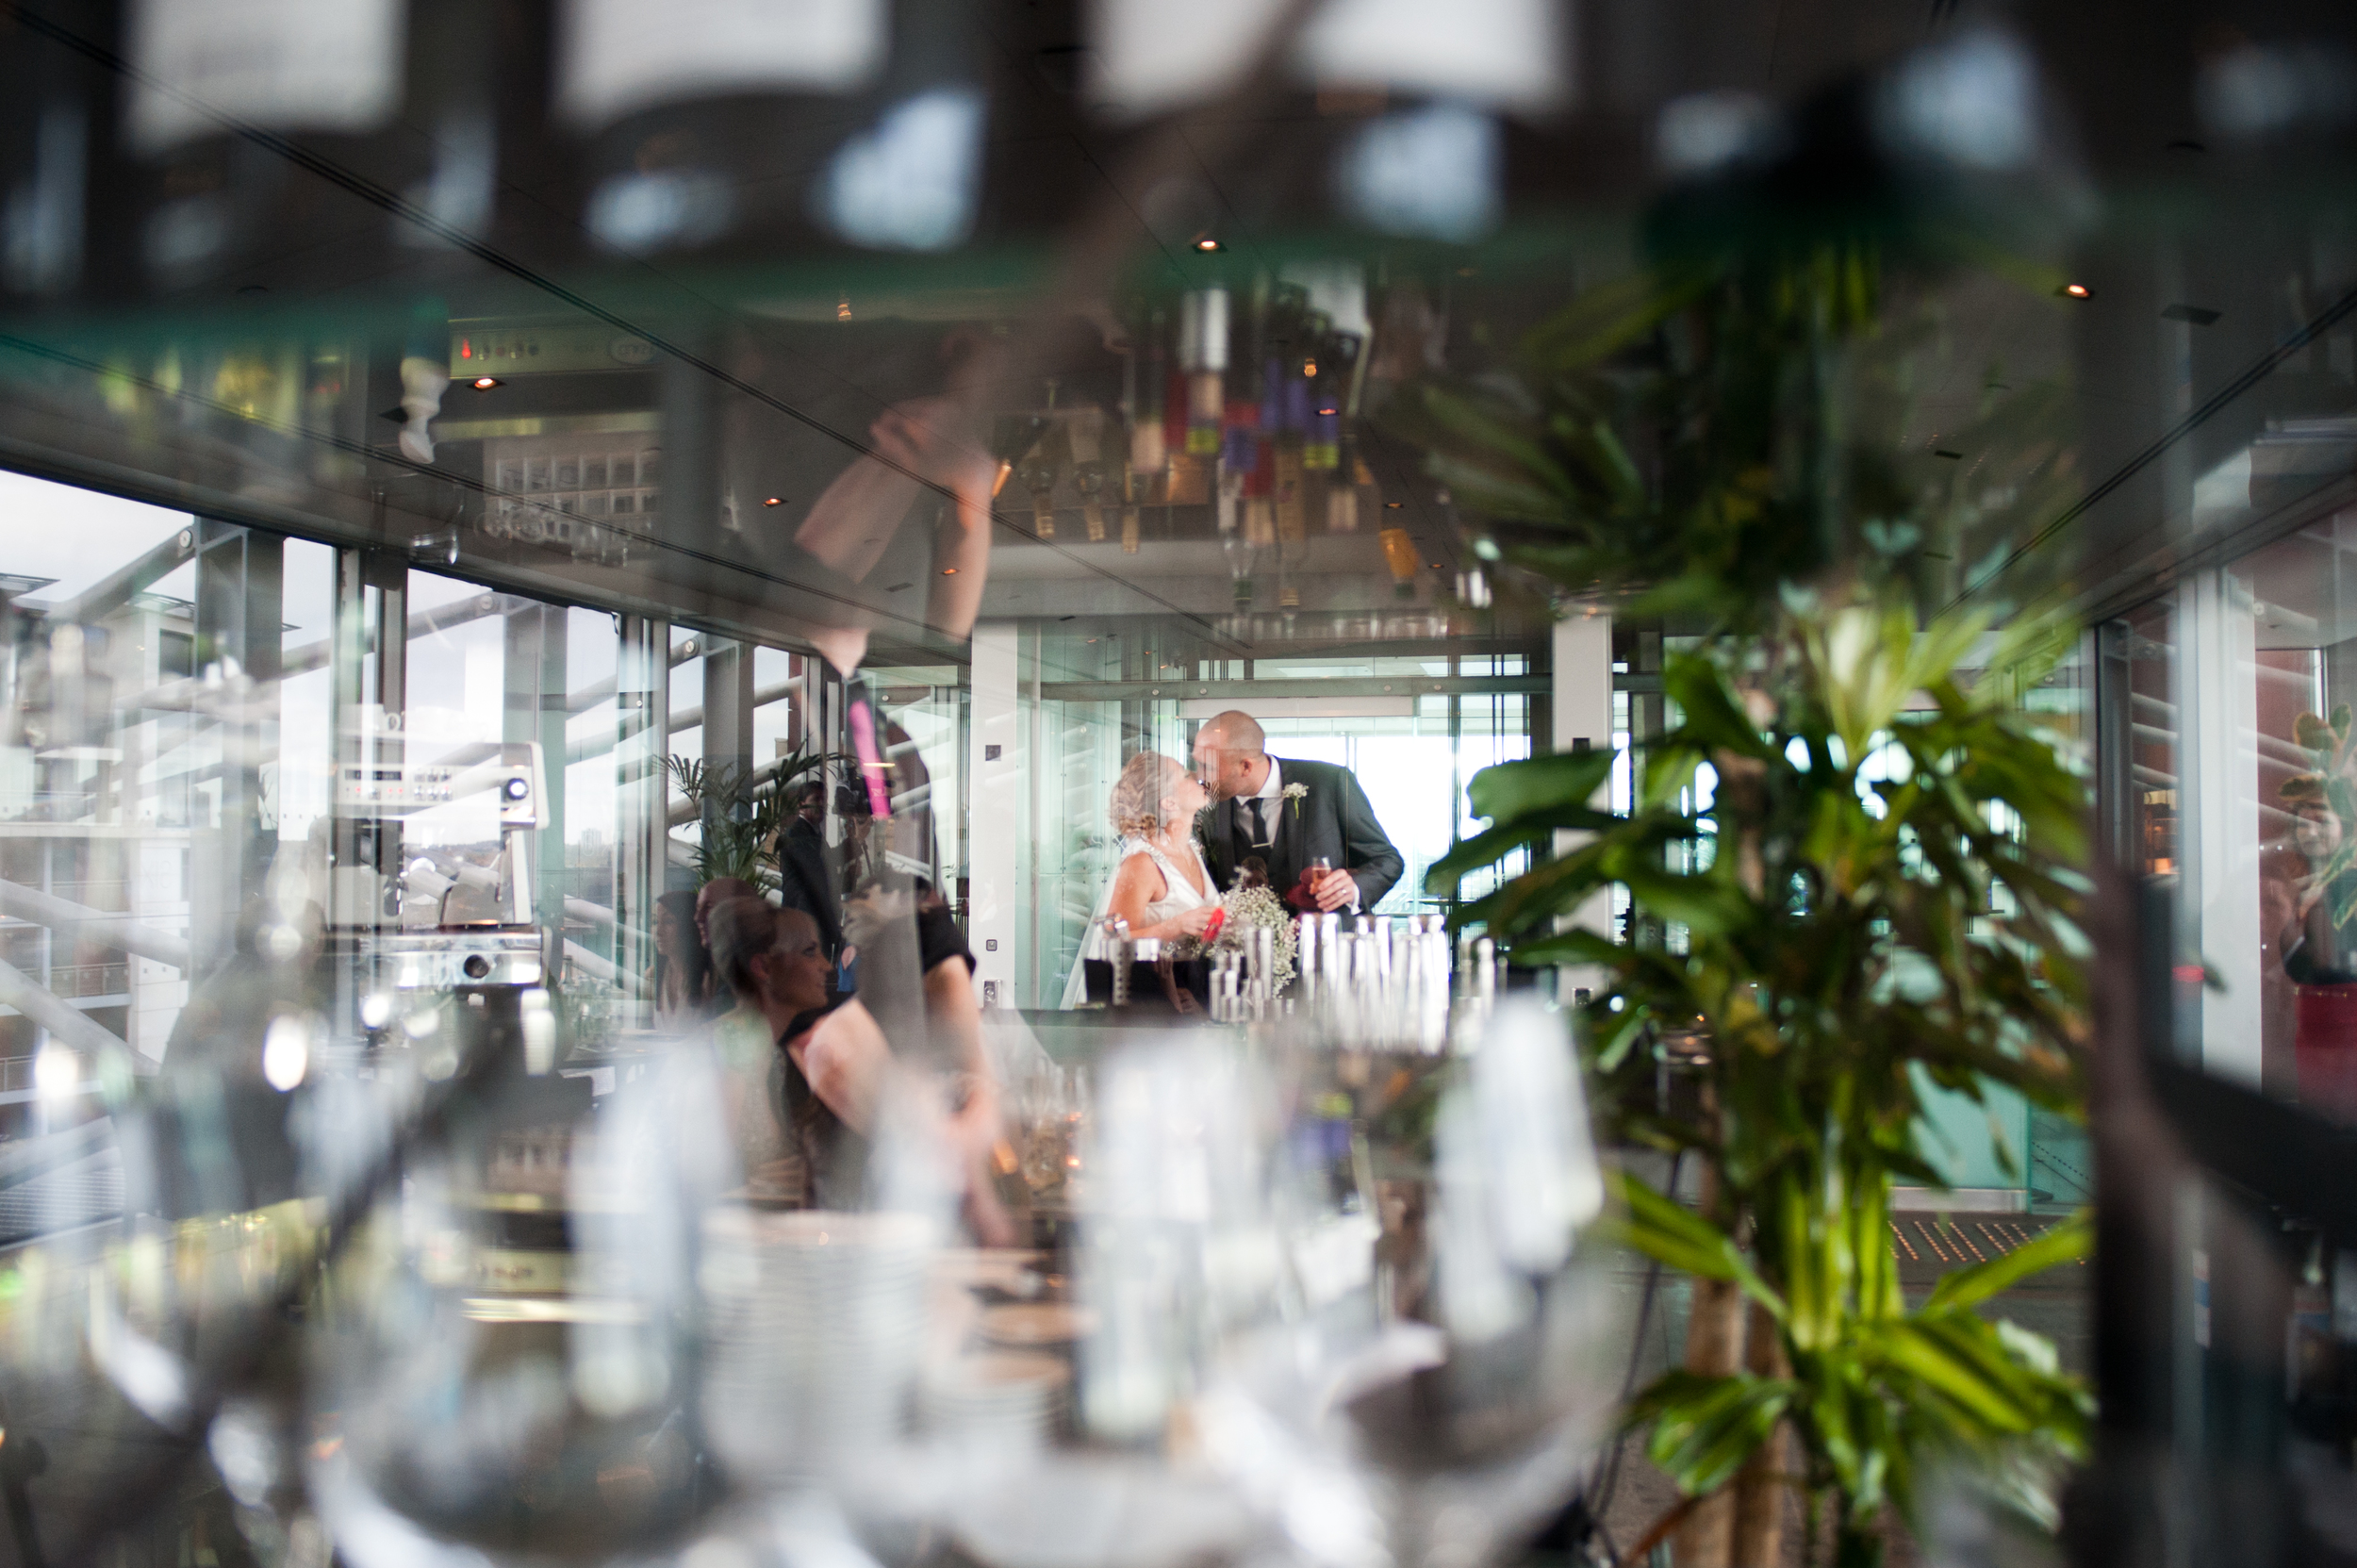 baltic-mill-wedding-photography-010.jpg